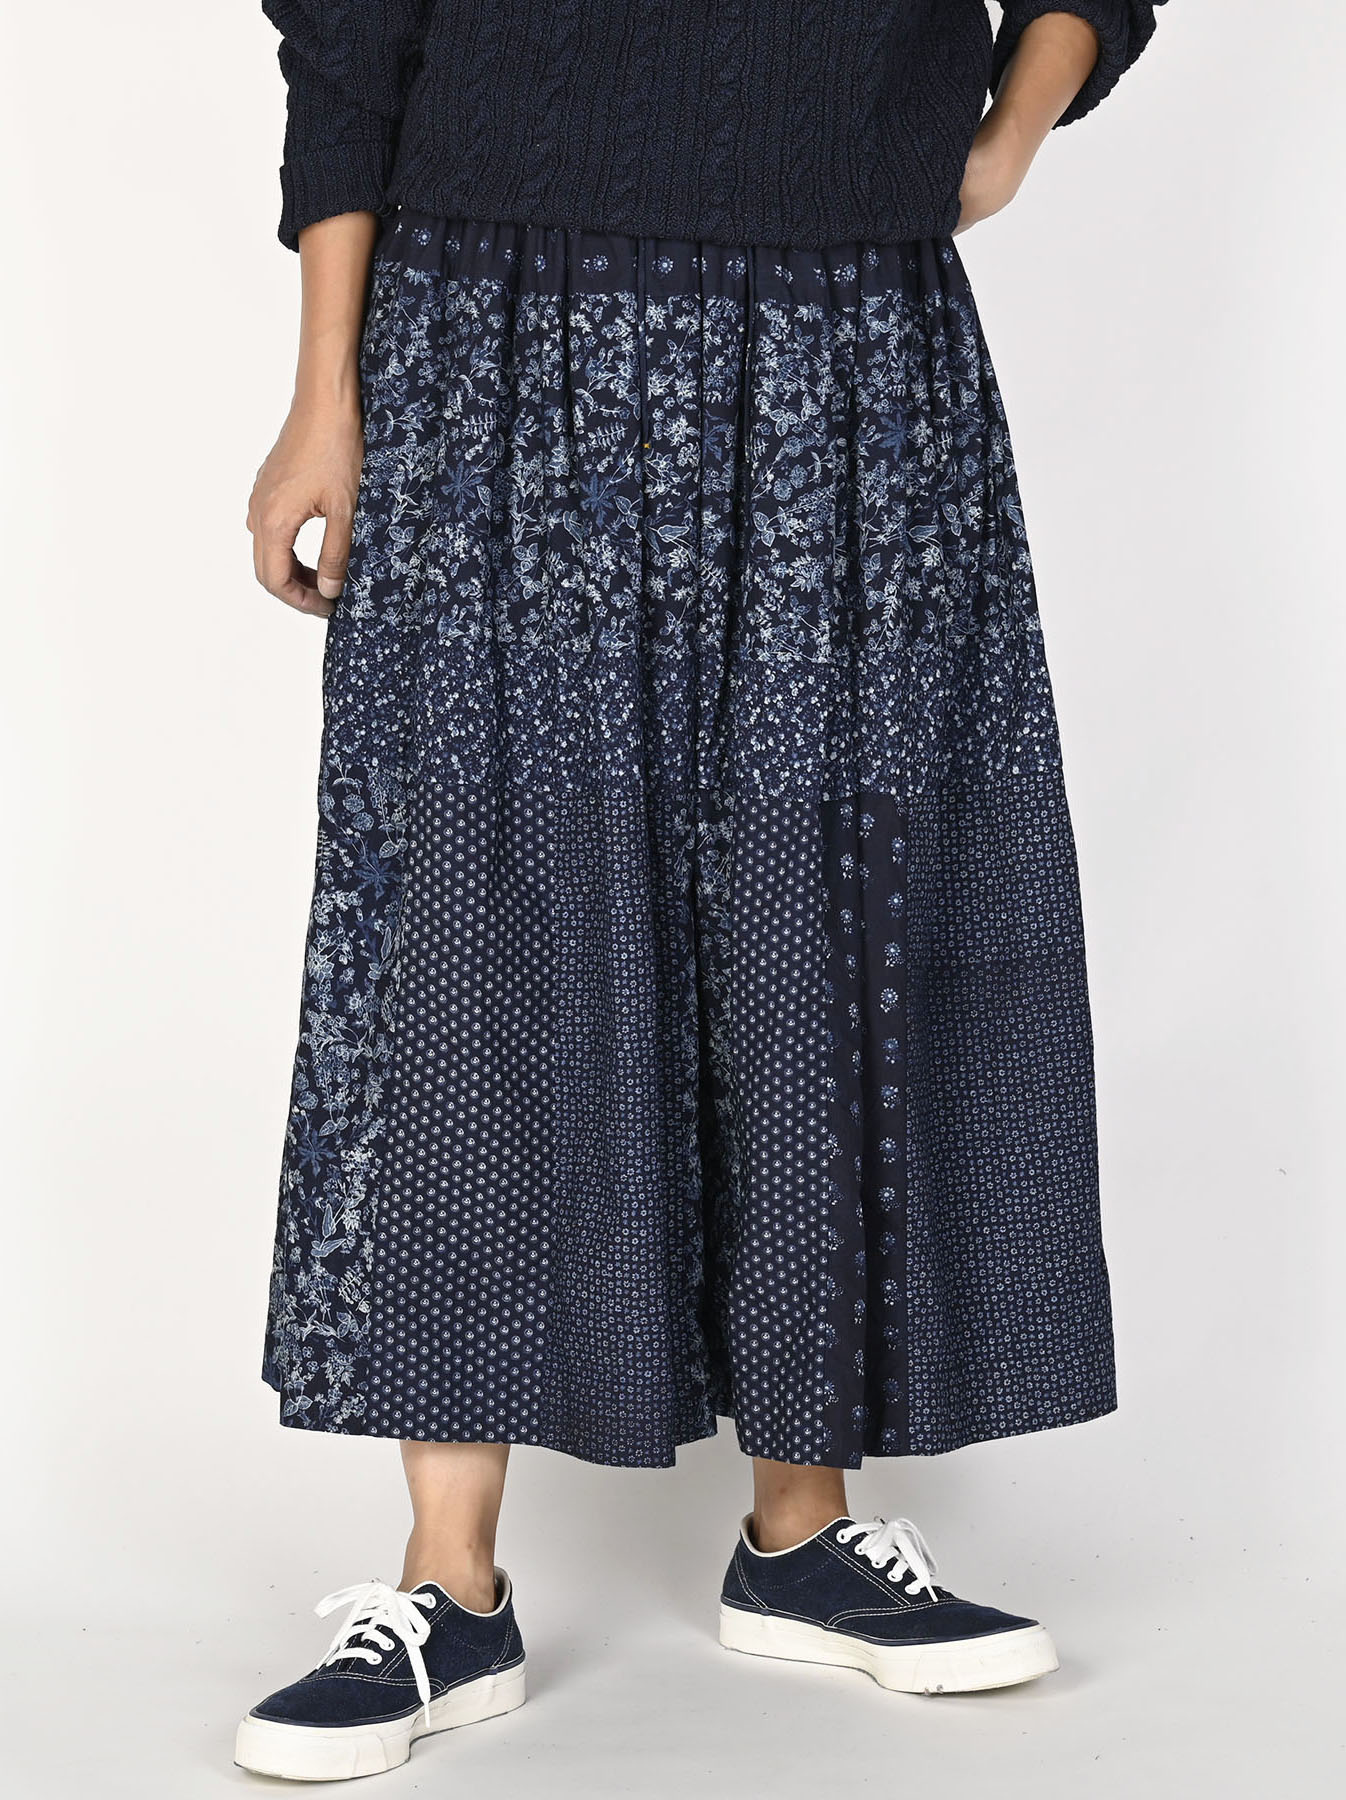 Indigo Tappet Flower Patchwork Skirt-2